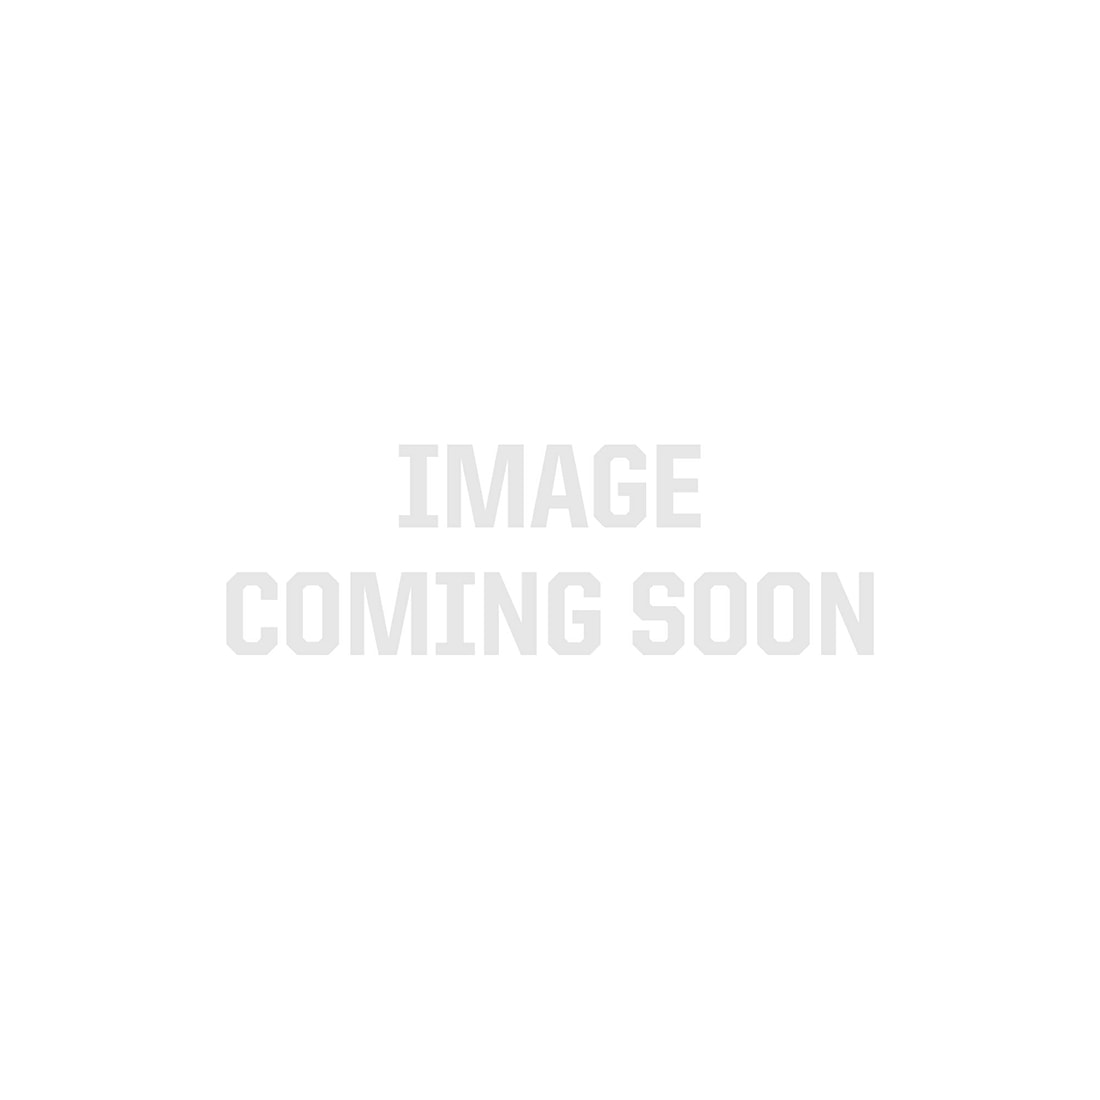 Daylight White 2216 TruColor LED Strip Light, 60/m, 8mm wide, Sample Kit